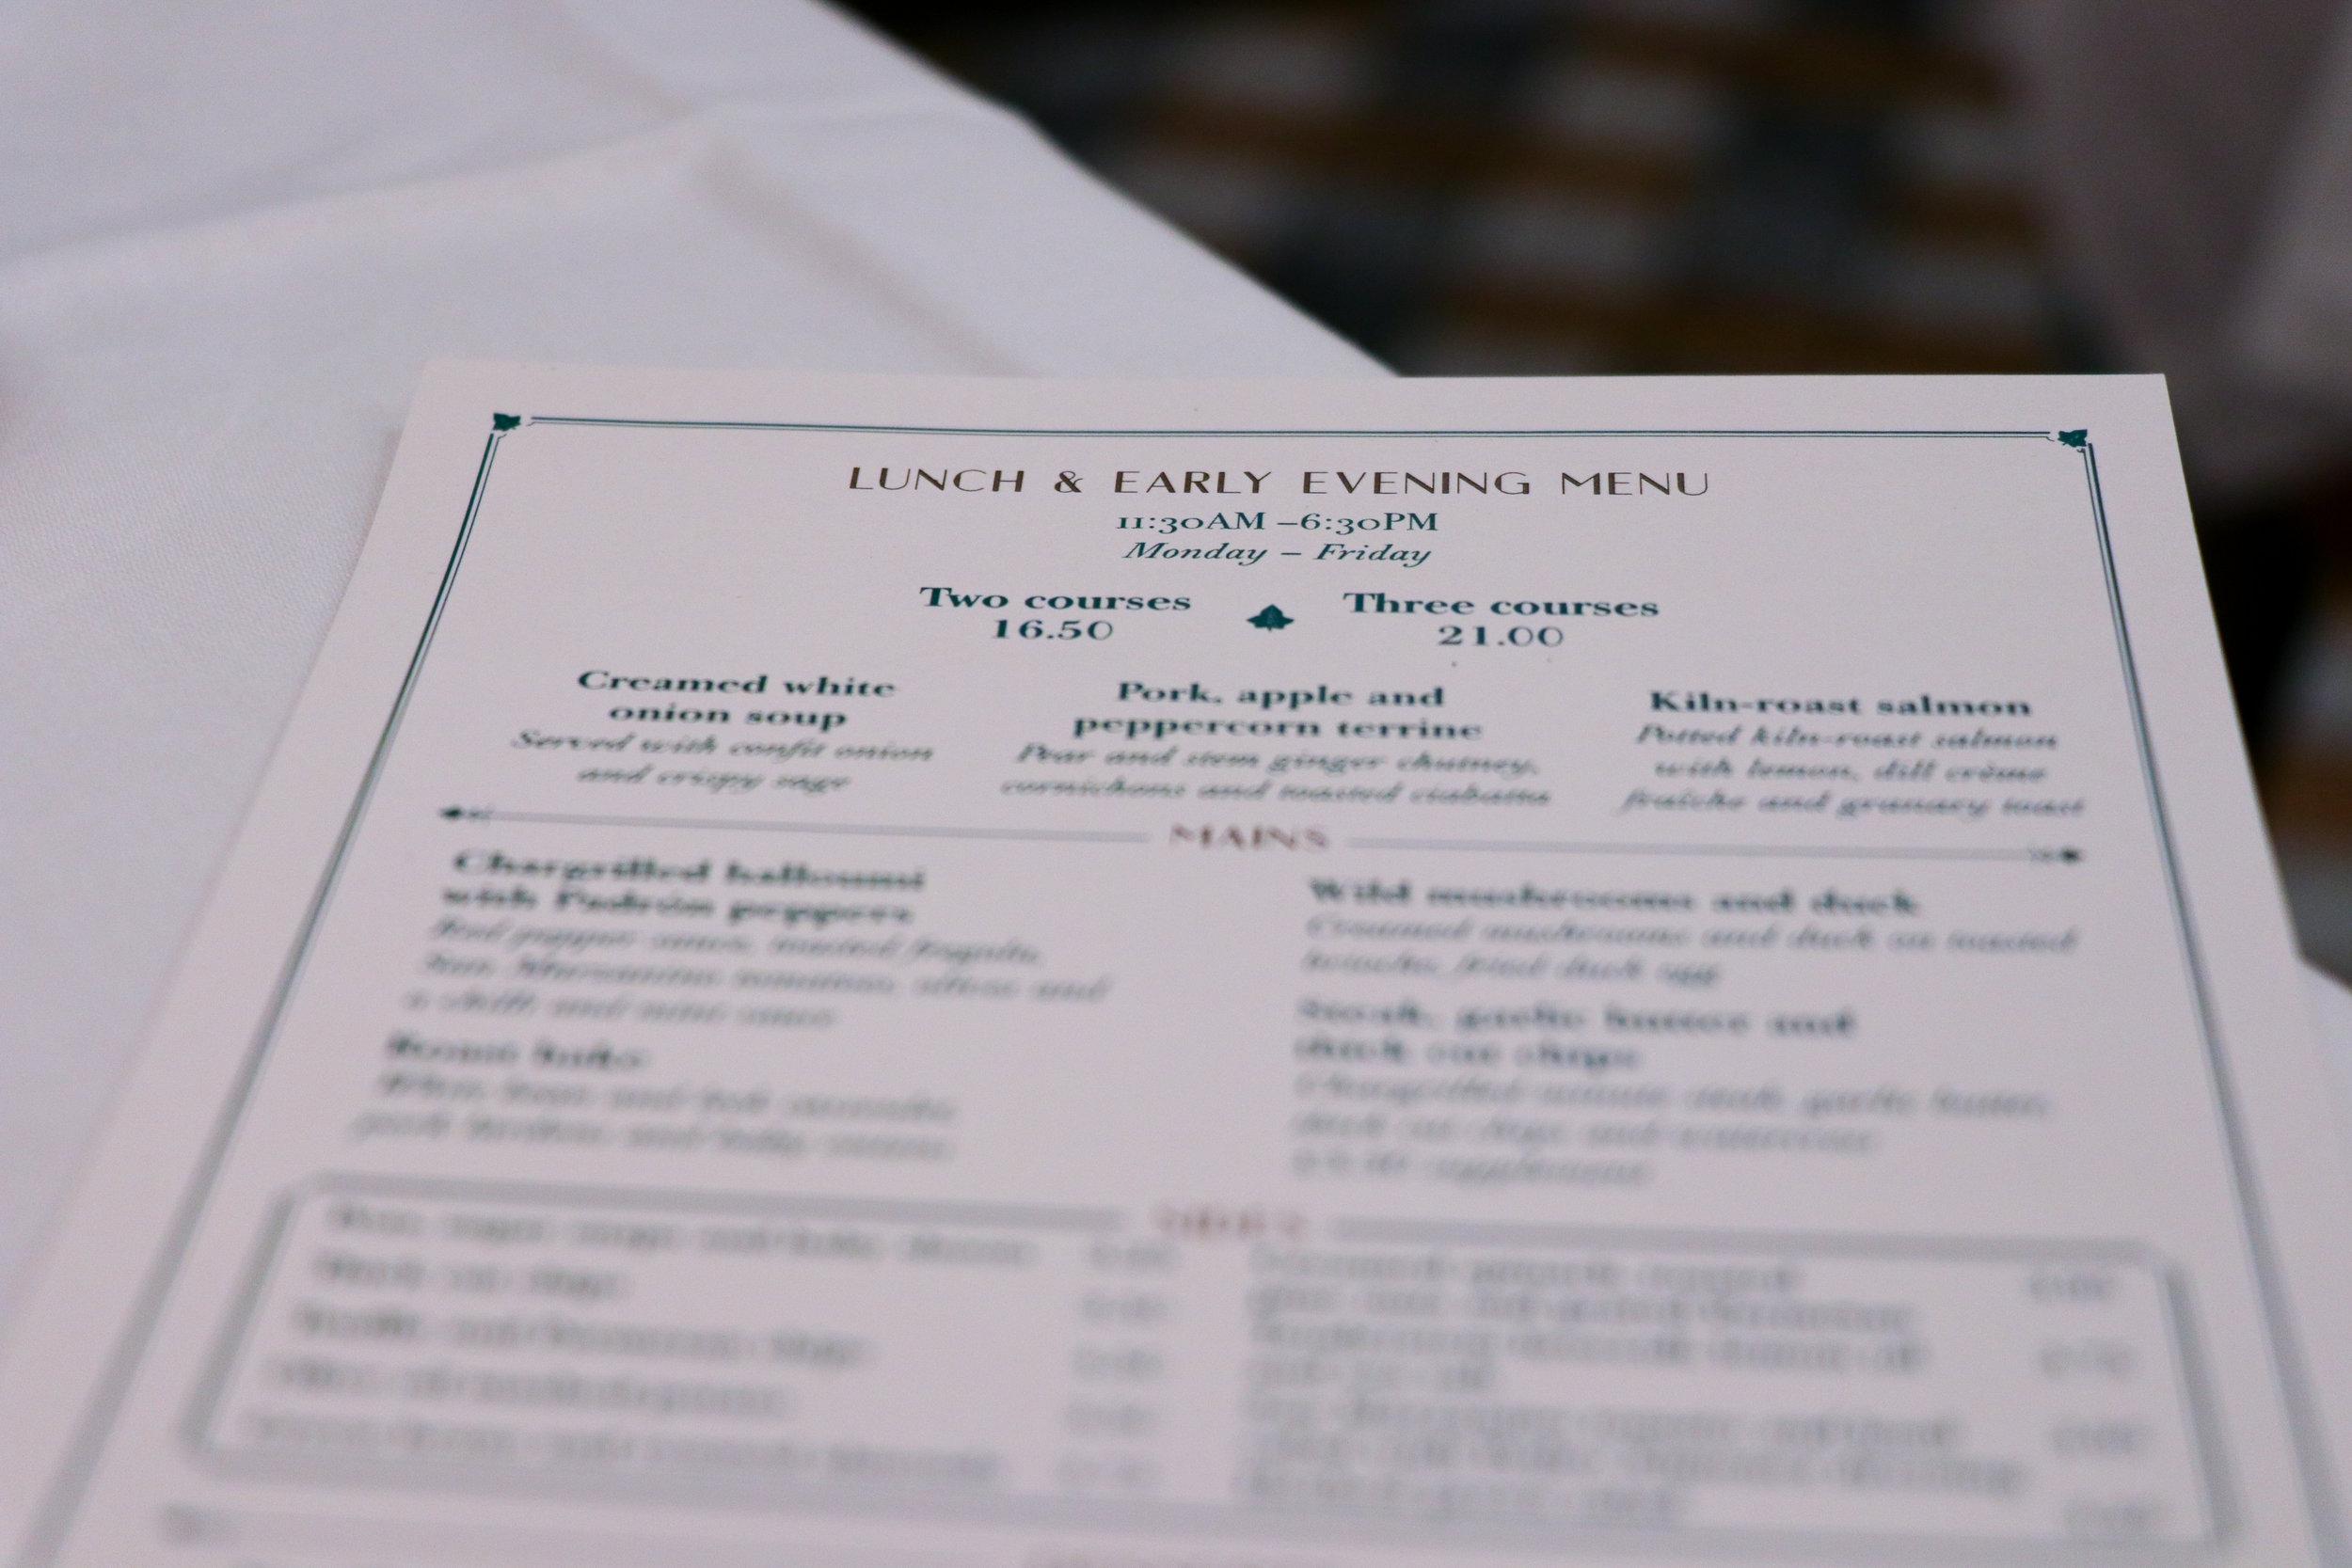 Set Menu at Ivy Bath Brasserie.jpg